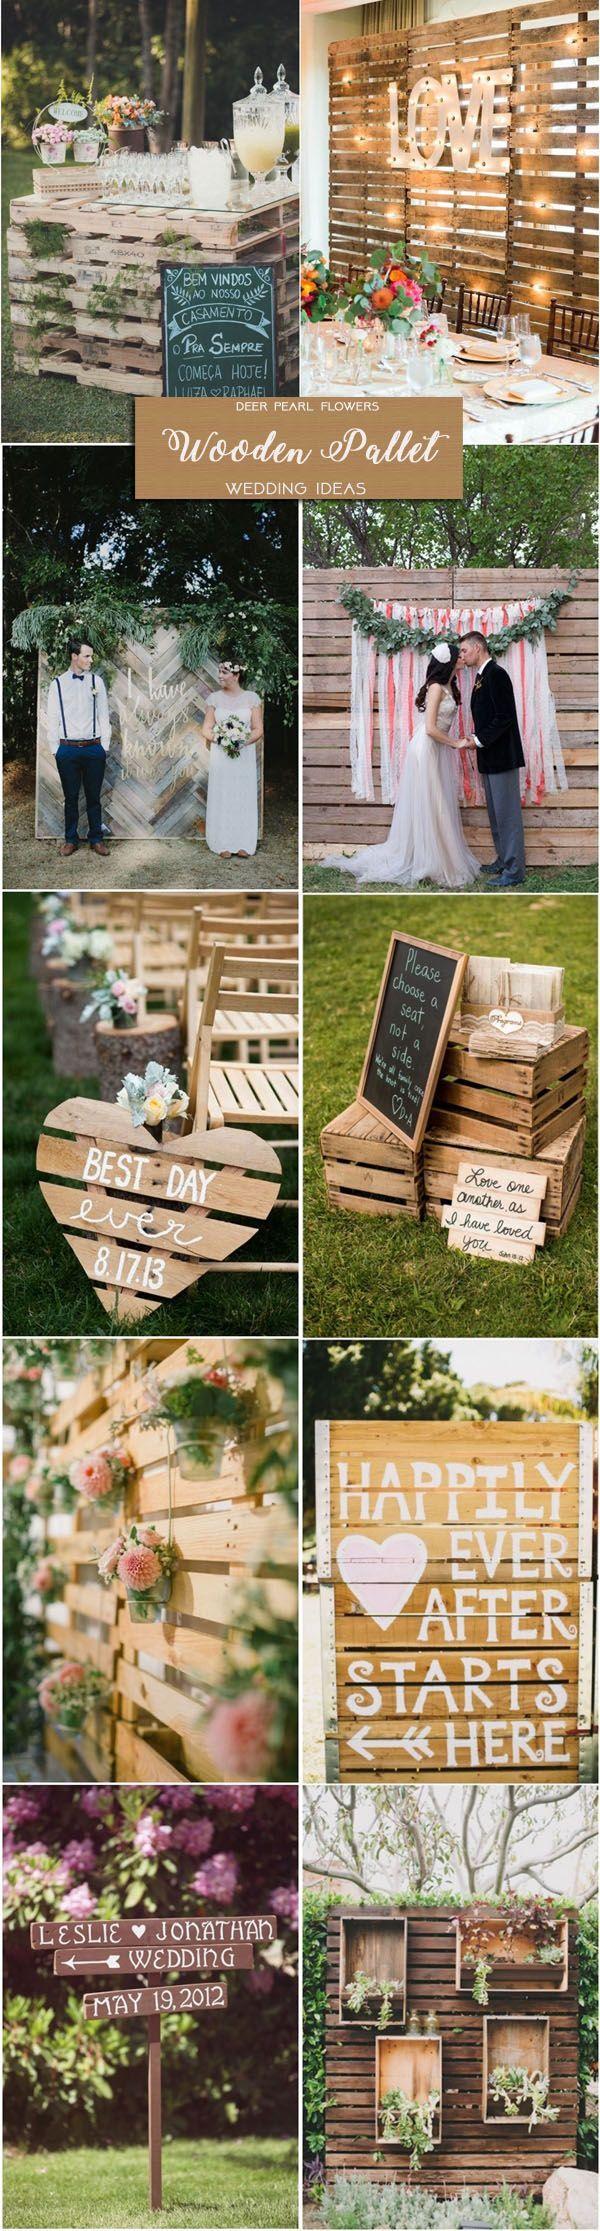 rustic country wedding ideas - wood pallets wedding decor ideas / http://www.deerpearlflowers.com/rustic-wedding-themes-ideas-part-2/